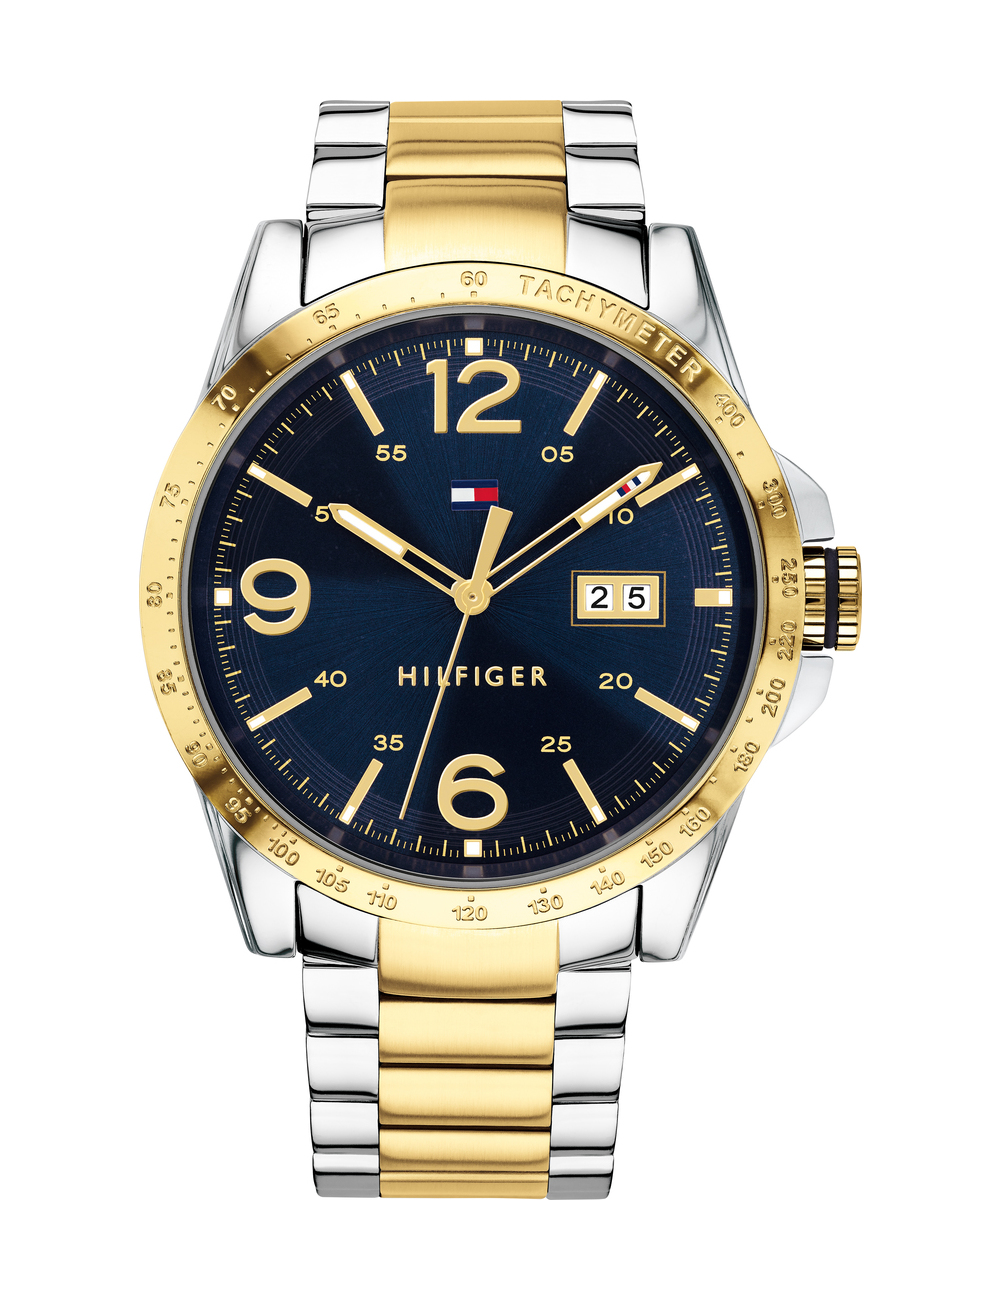 88044f35 Tommy Hilfiger watches in UAE, Qatar, Bahrain & Oman at Hour Choice